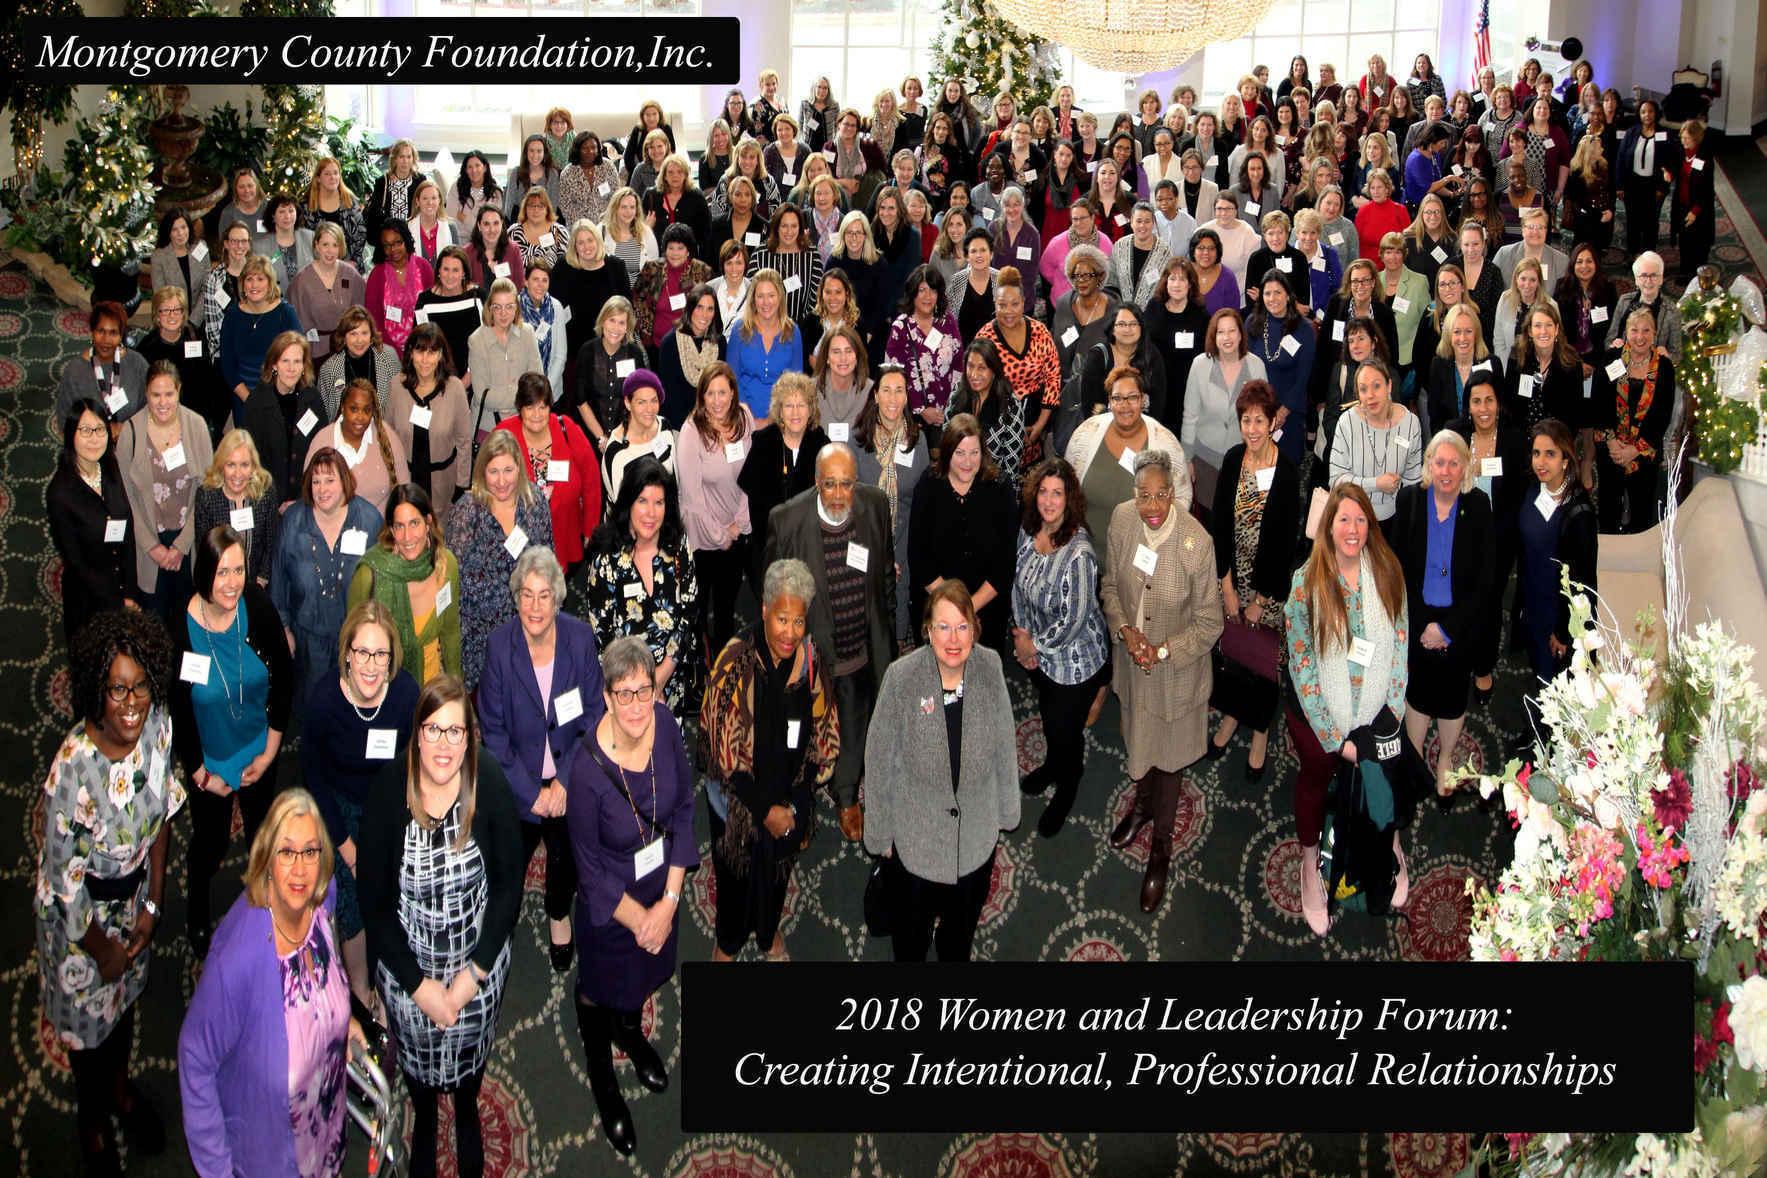 Women's Leadership Forum - 2019 image